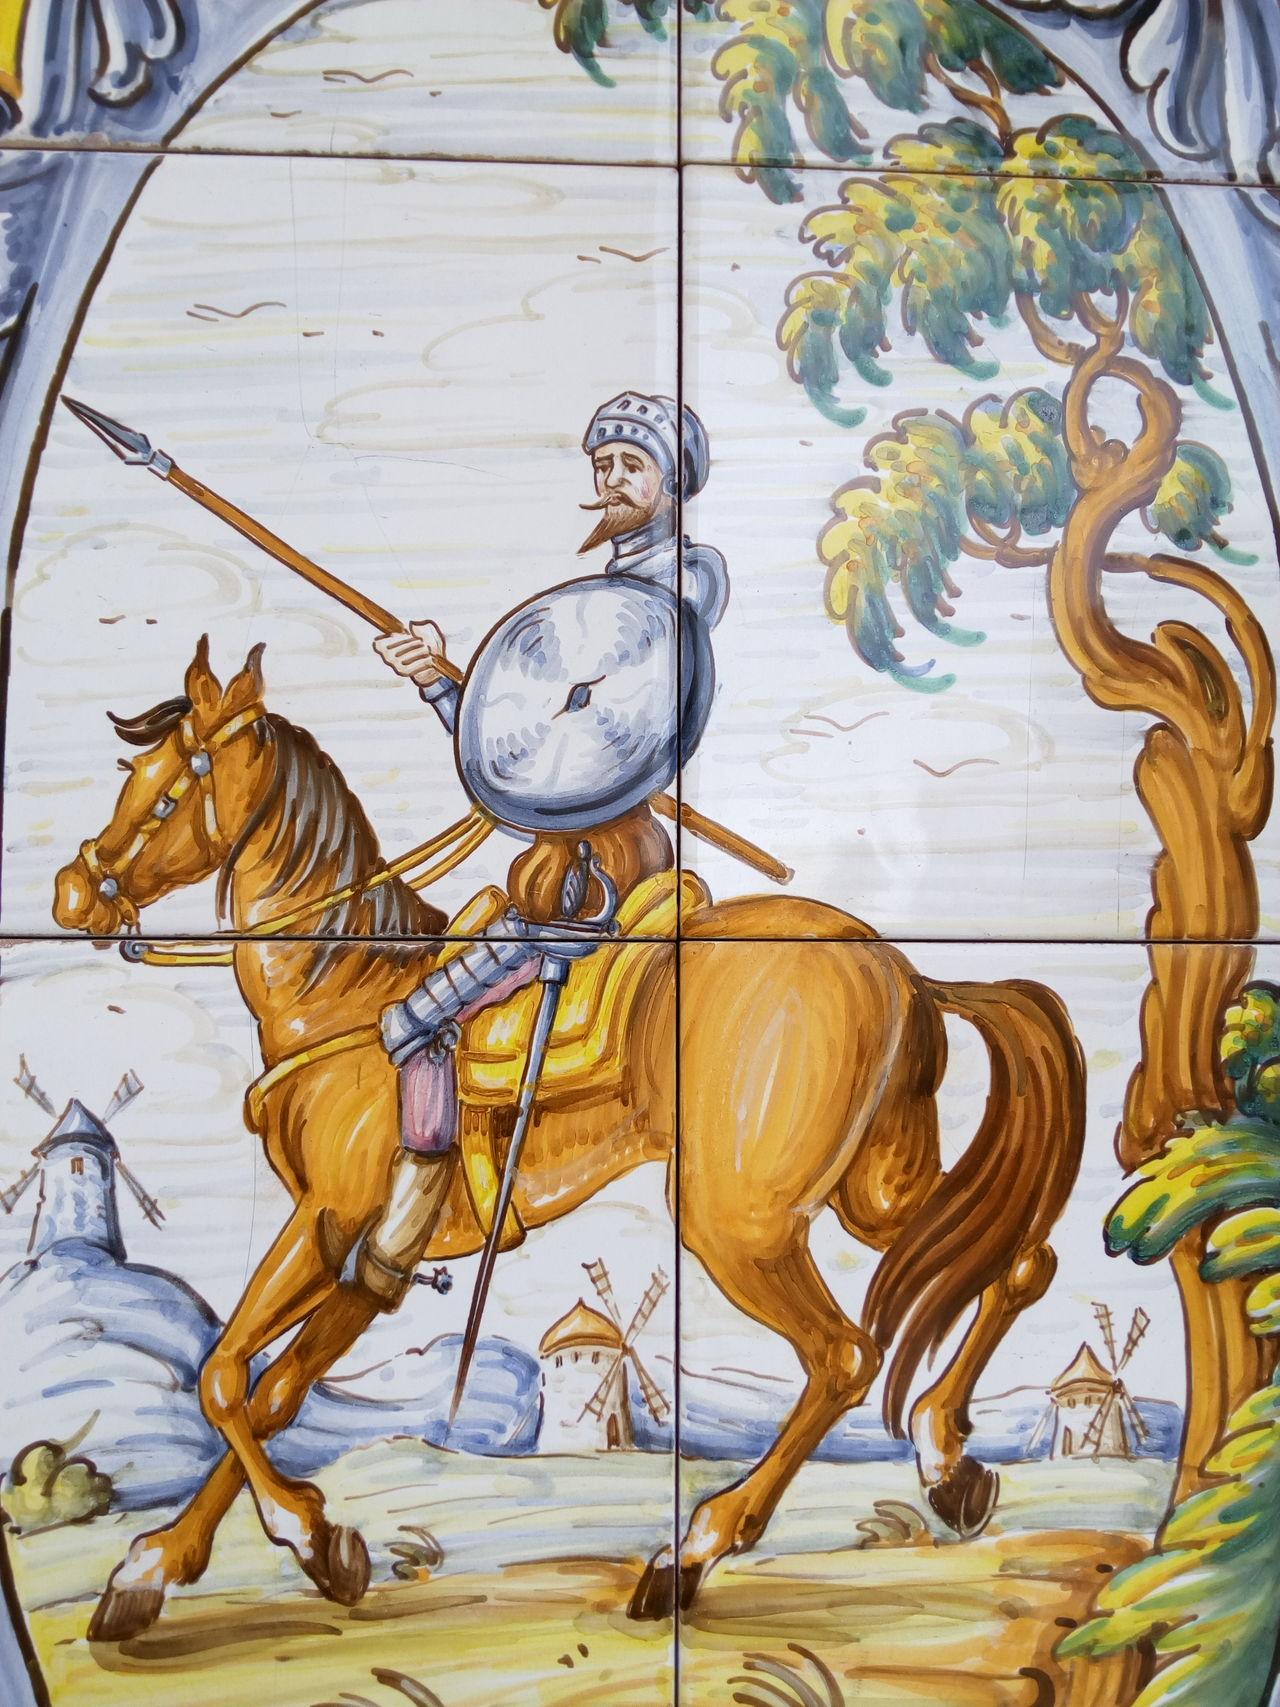 Ceramics Ceramic Ceramic Art Ceramic Tiles Ceramica Art Quijote Quixote Talavera De La Reina Toledo España SPAIN